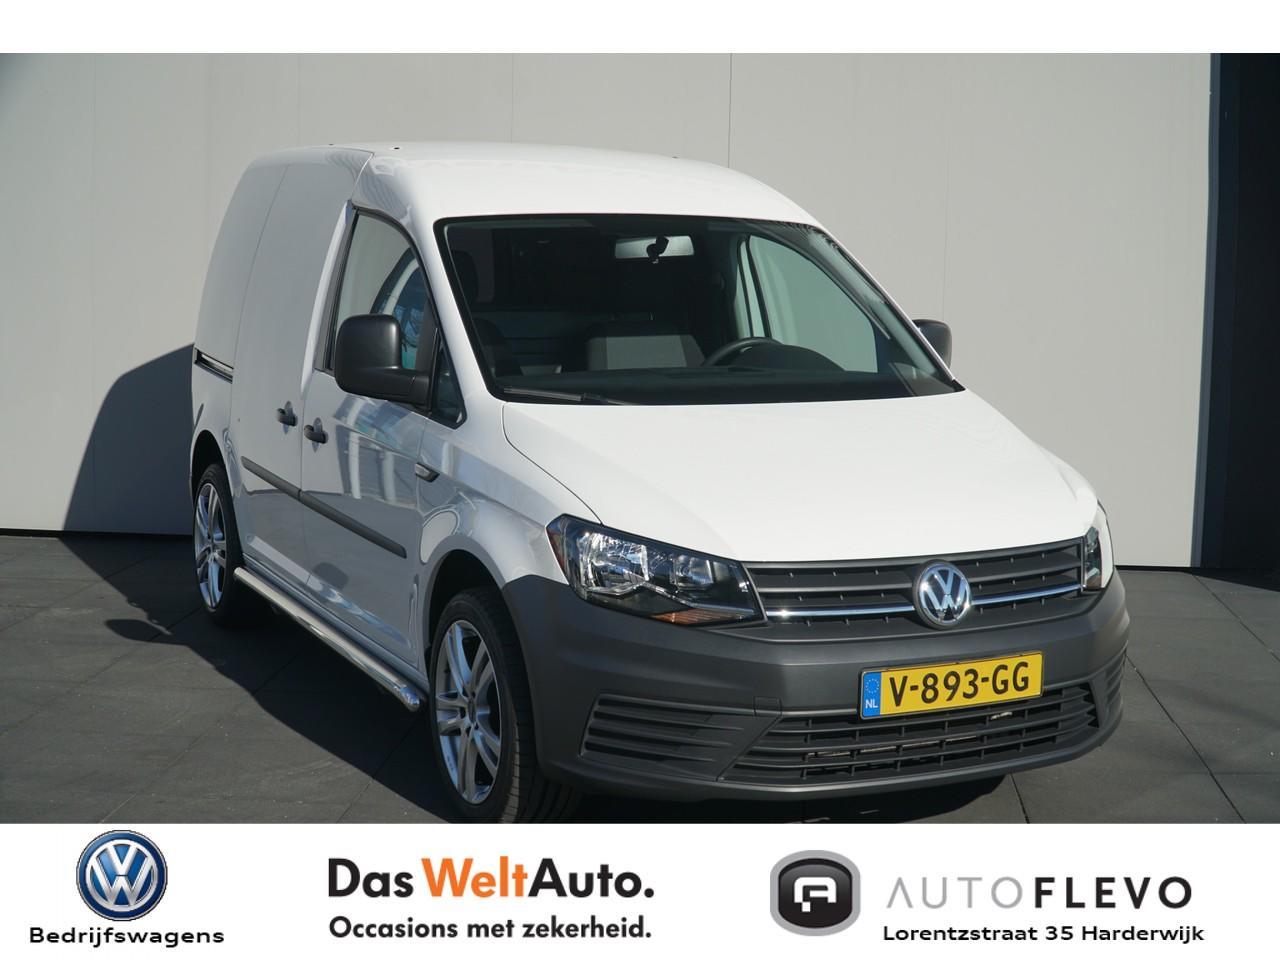 Volkswagen Caddy 2.0 tdi trekhaak/airco/lm velgen/radio/bluetooth/sidebaars/trendline